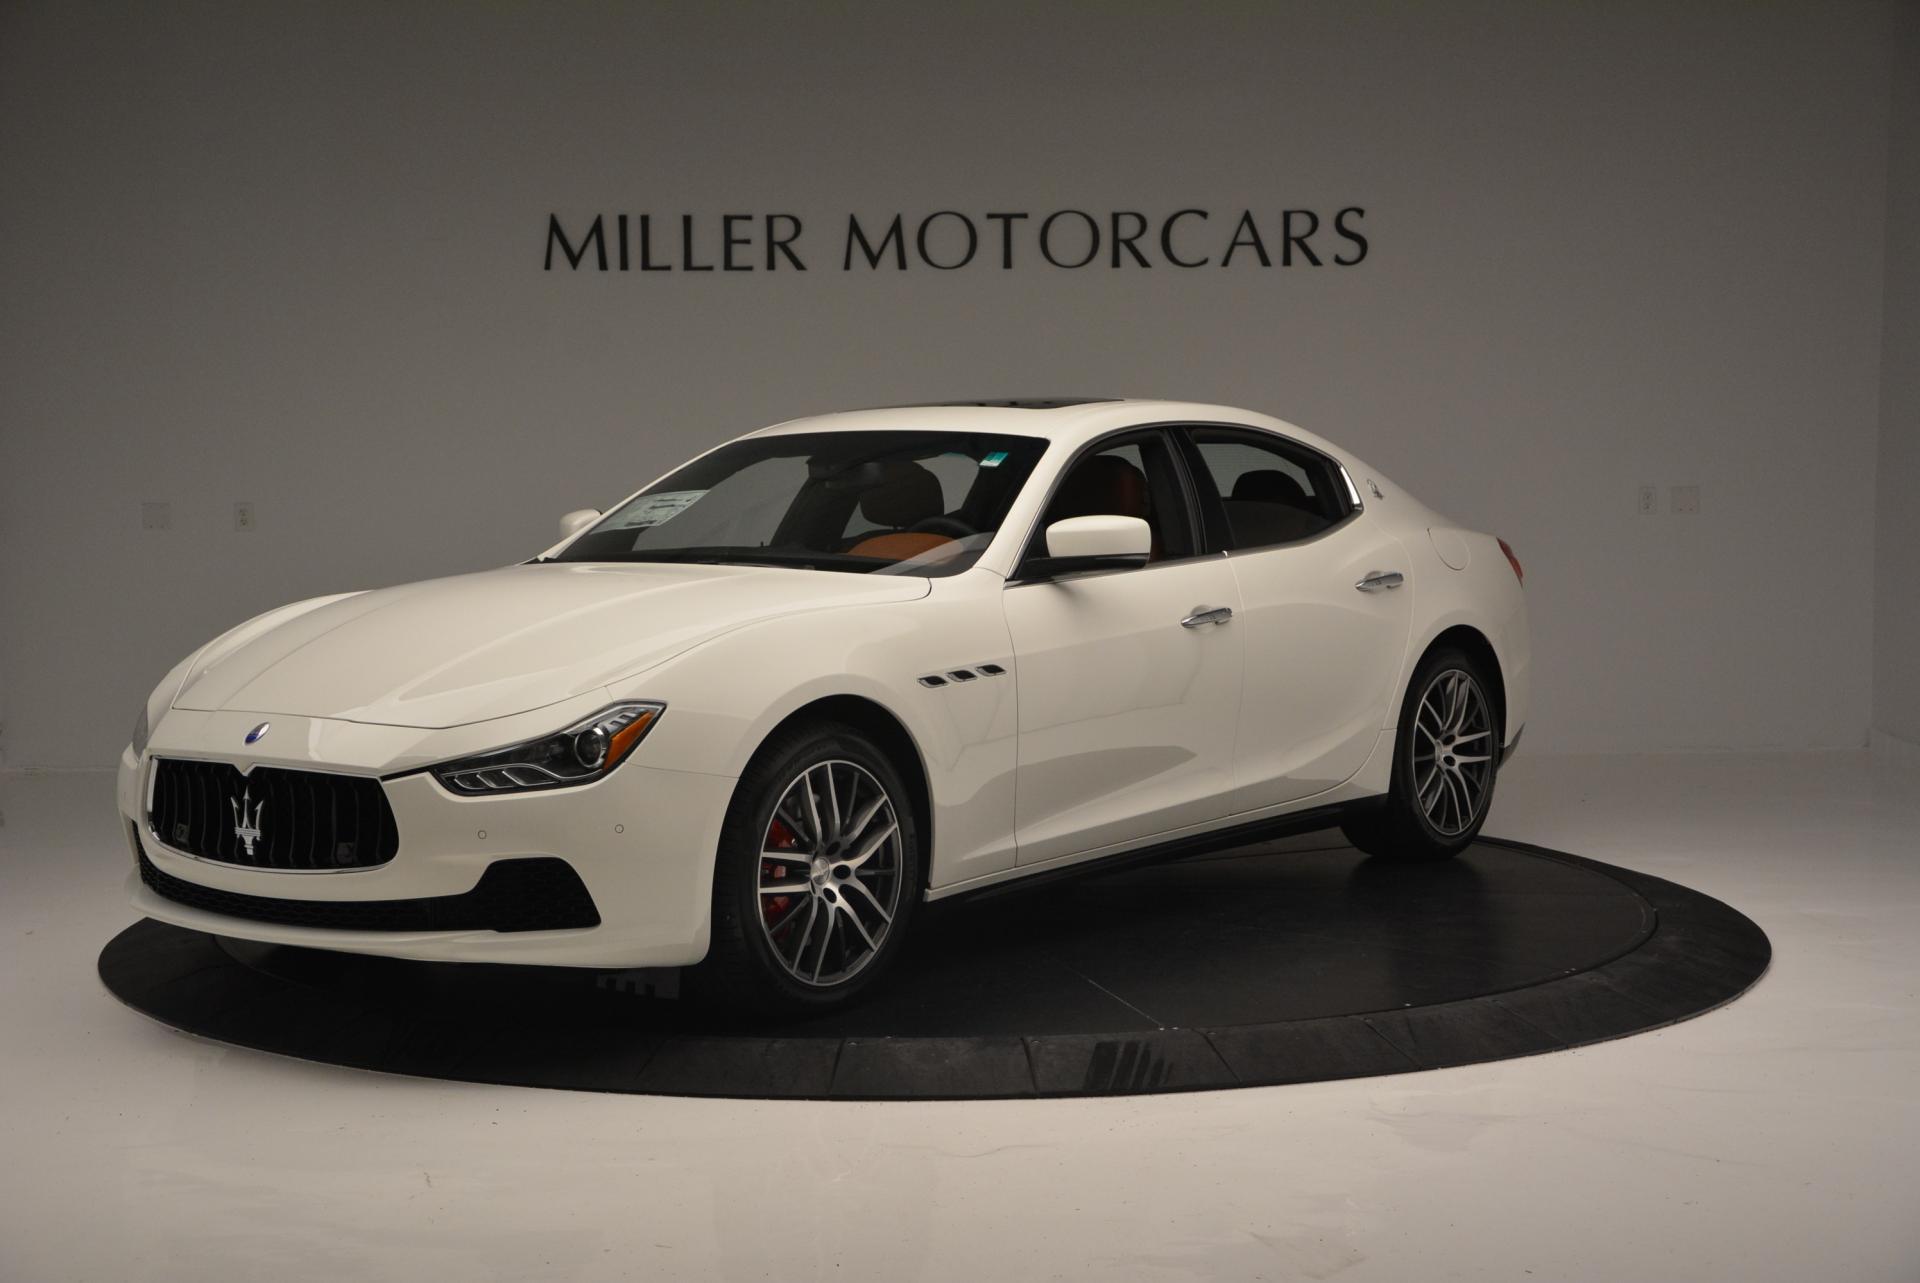 New 2016 Maserati Ghibli S Q4 For Sale In Greenwich, CT. Alfa Romeo of Greenwich, M1606 118_main